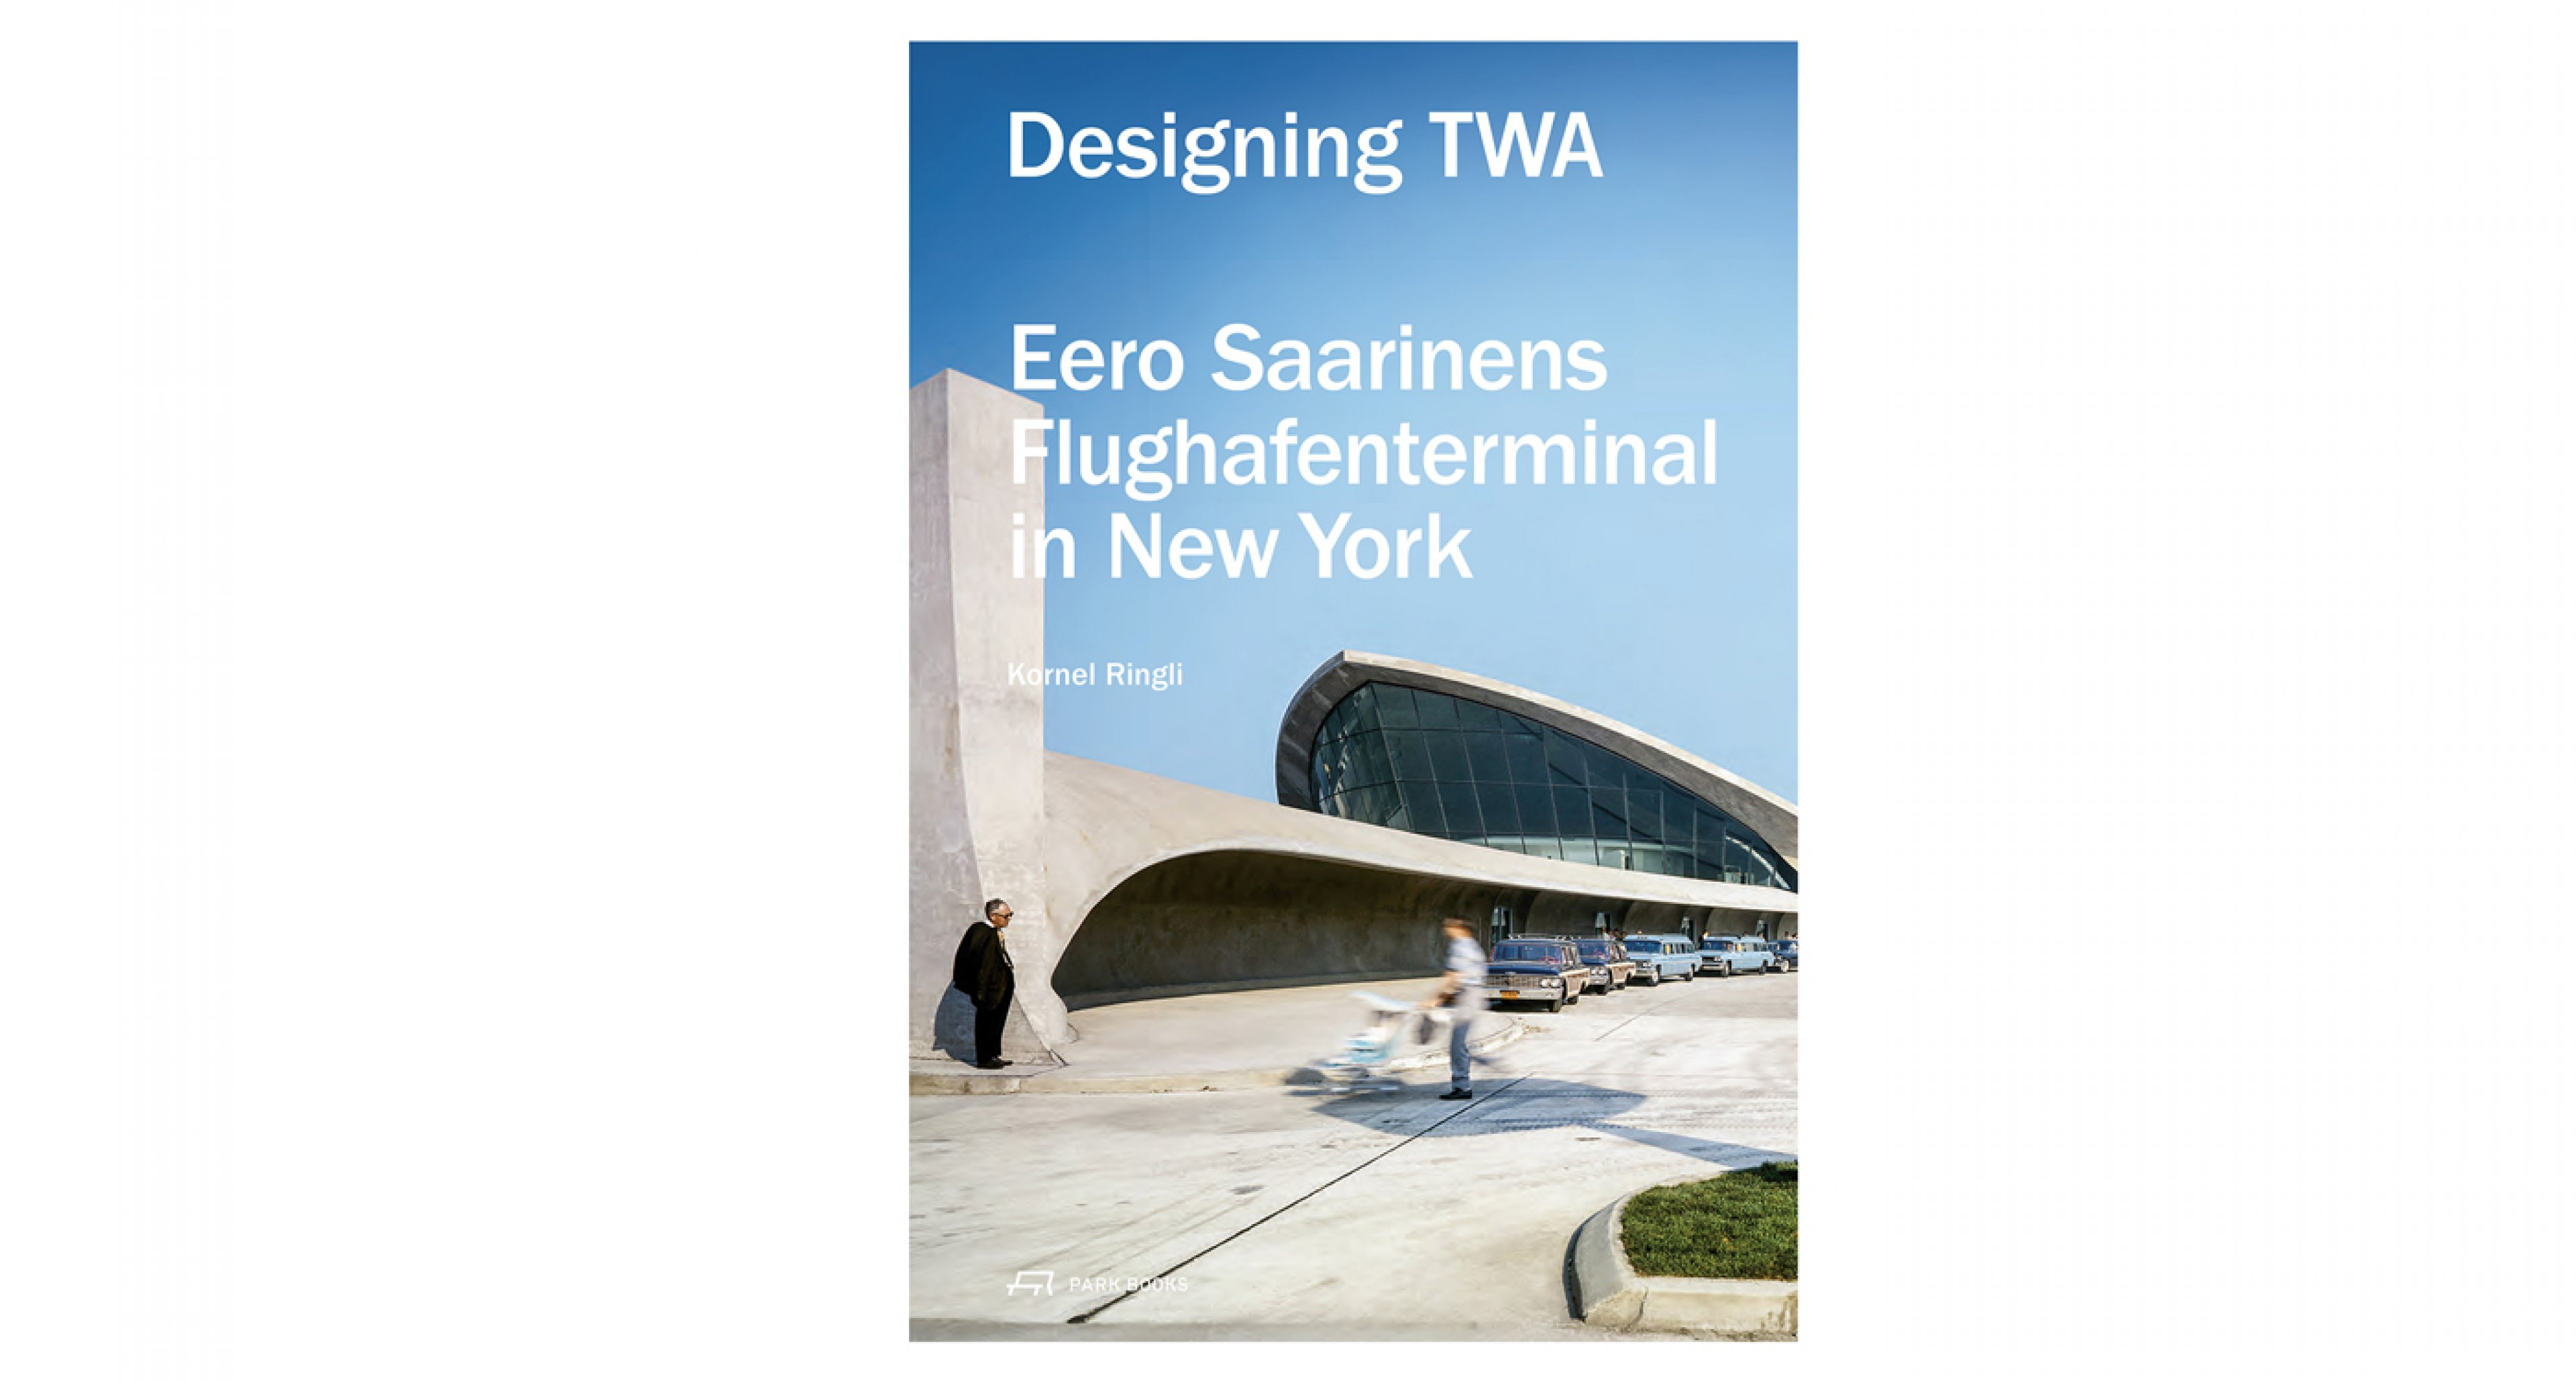 Designing TWA - Eero Saarinens Flughafenterminal in New York